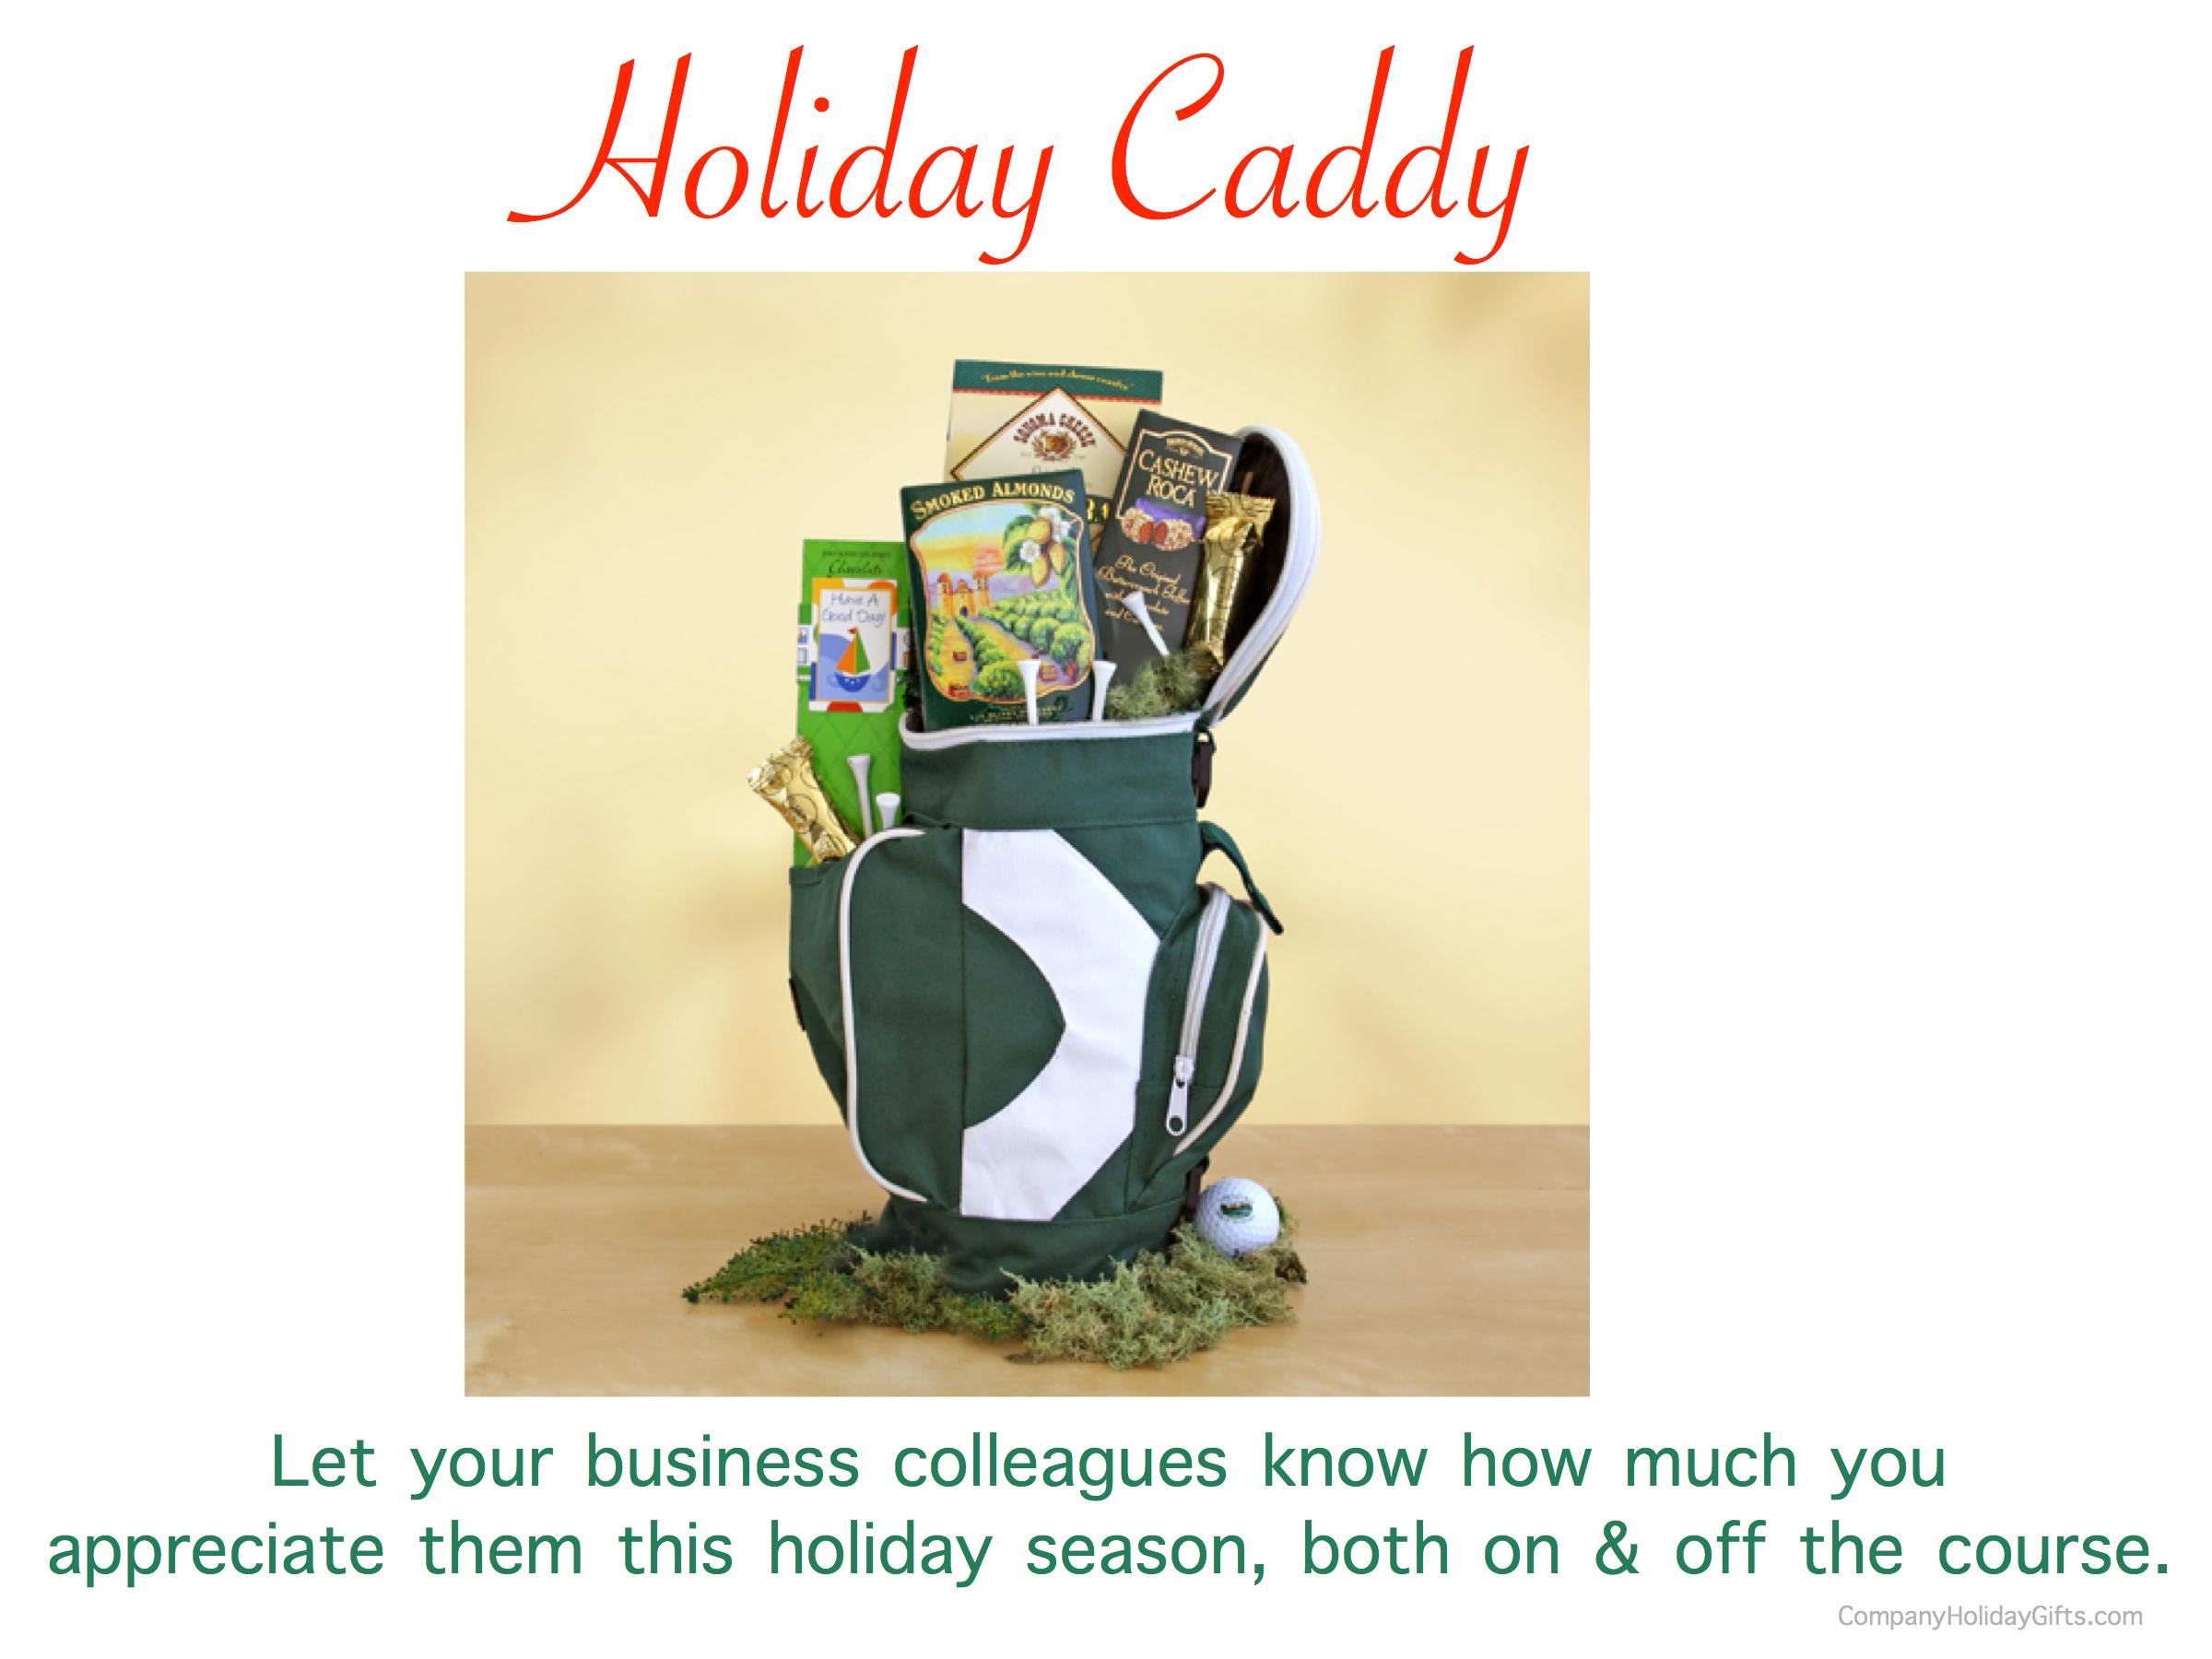 Holiday Caddy